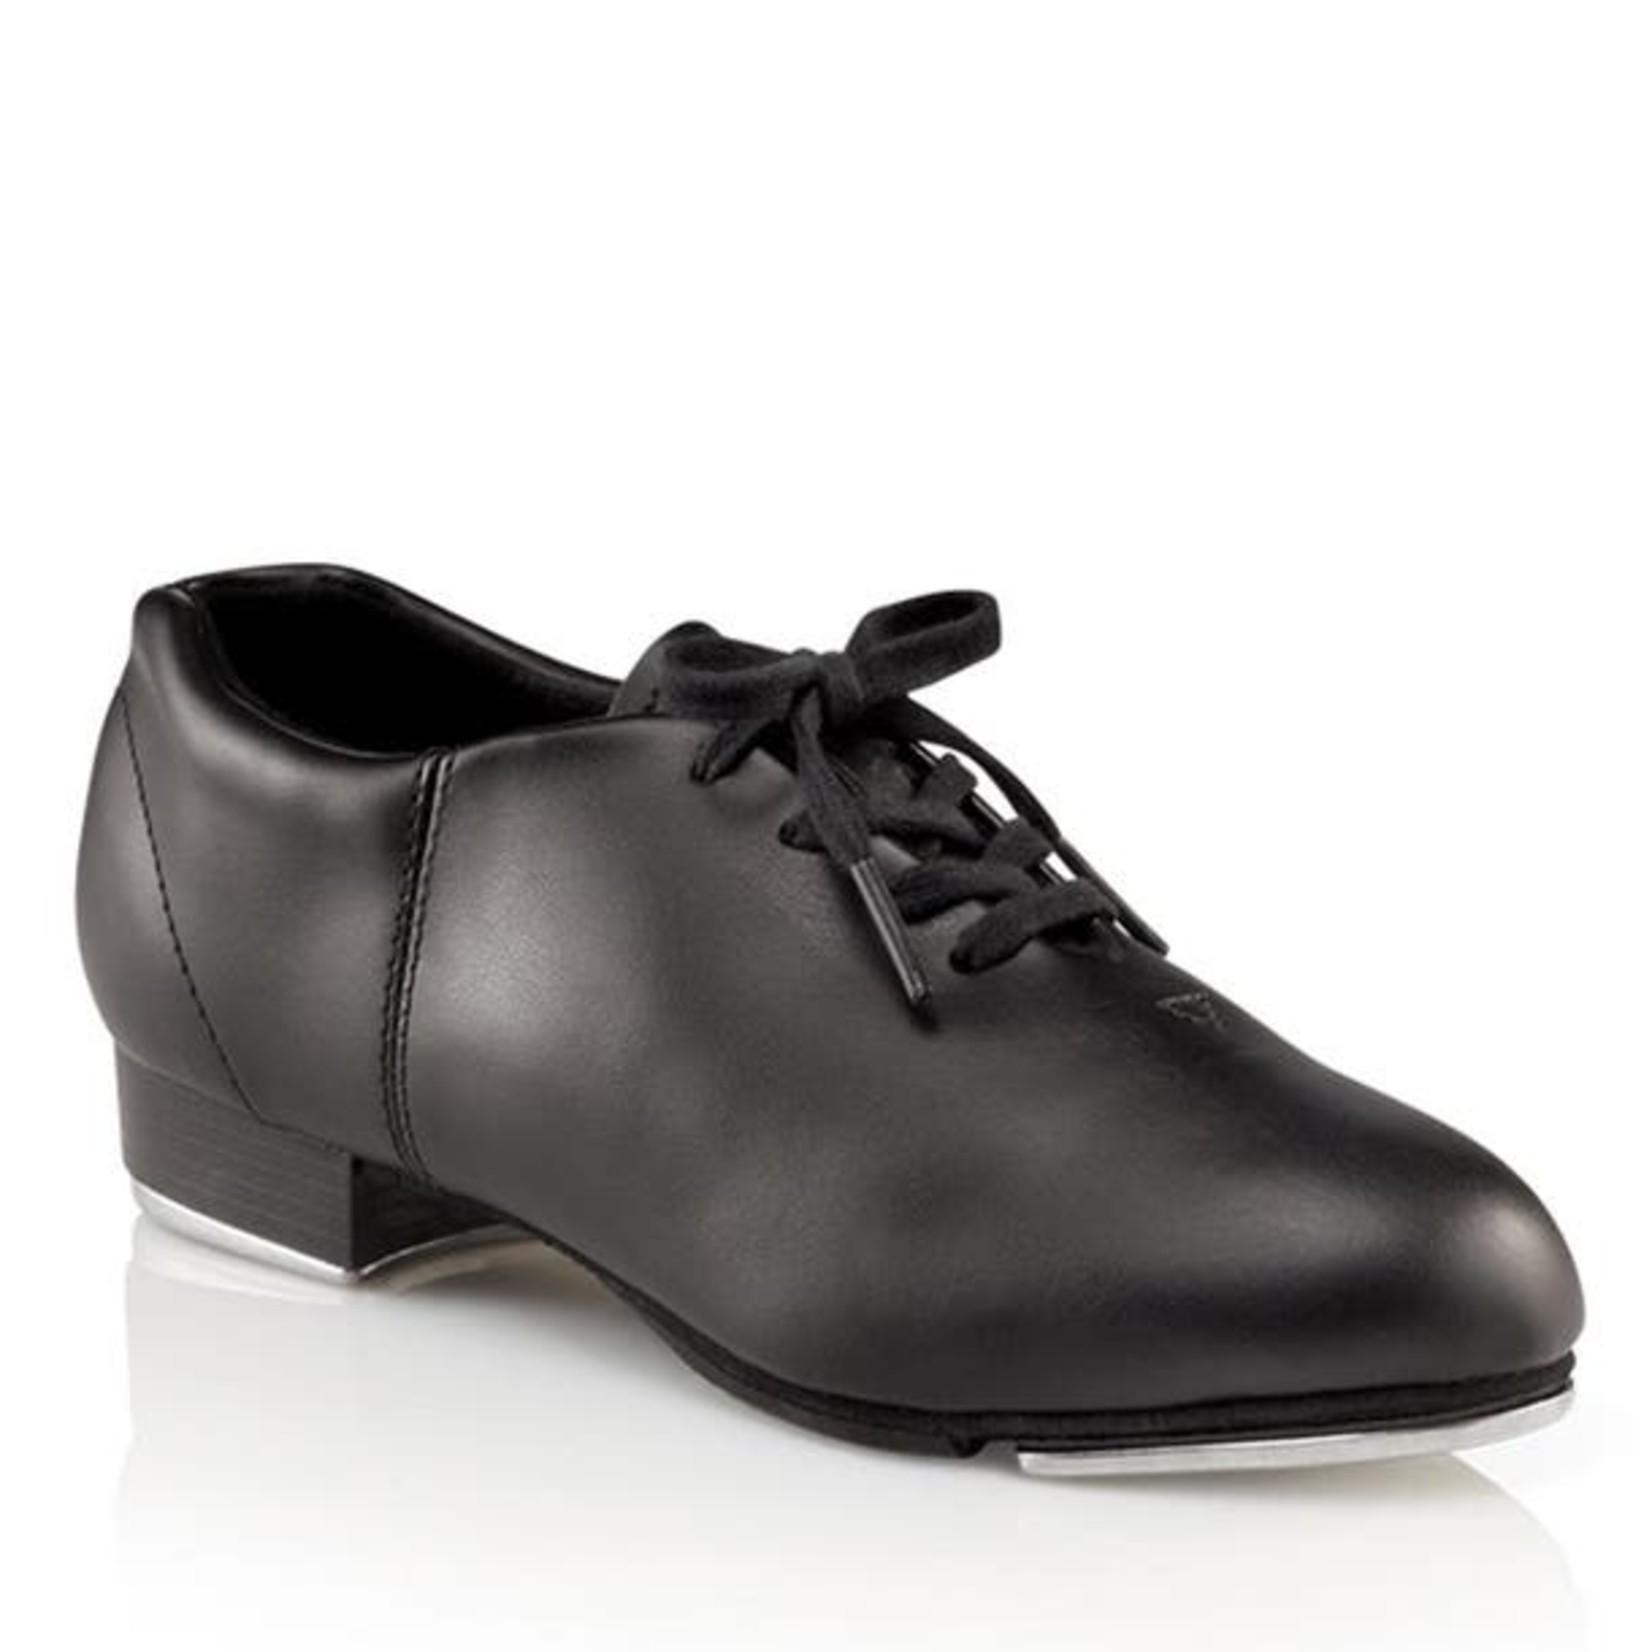 Capezio Capezio CG17 Fluid Tap Shoe